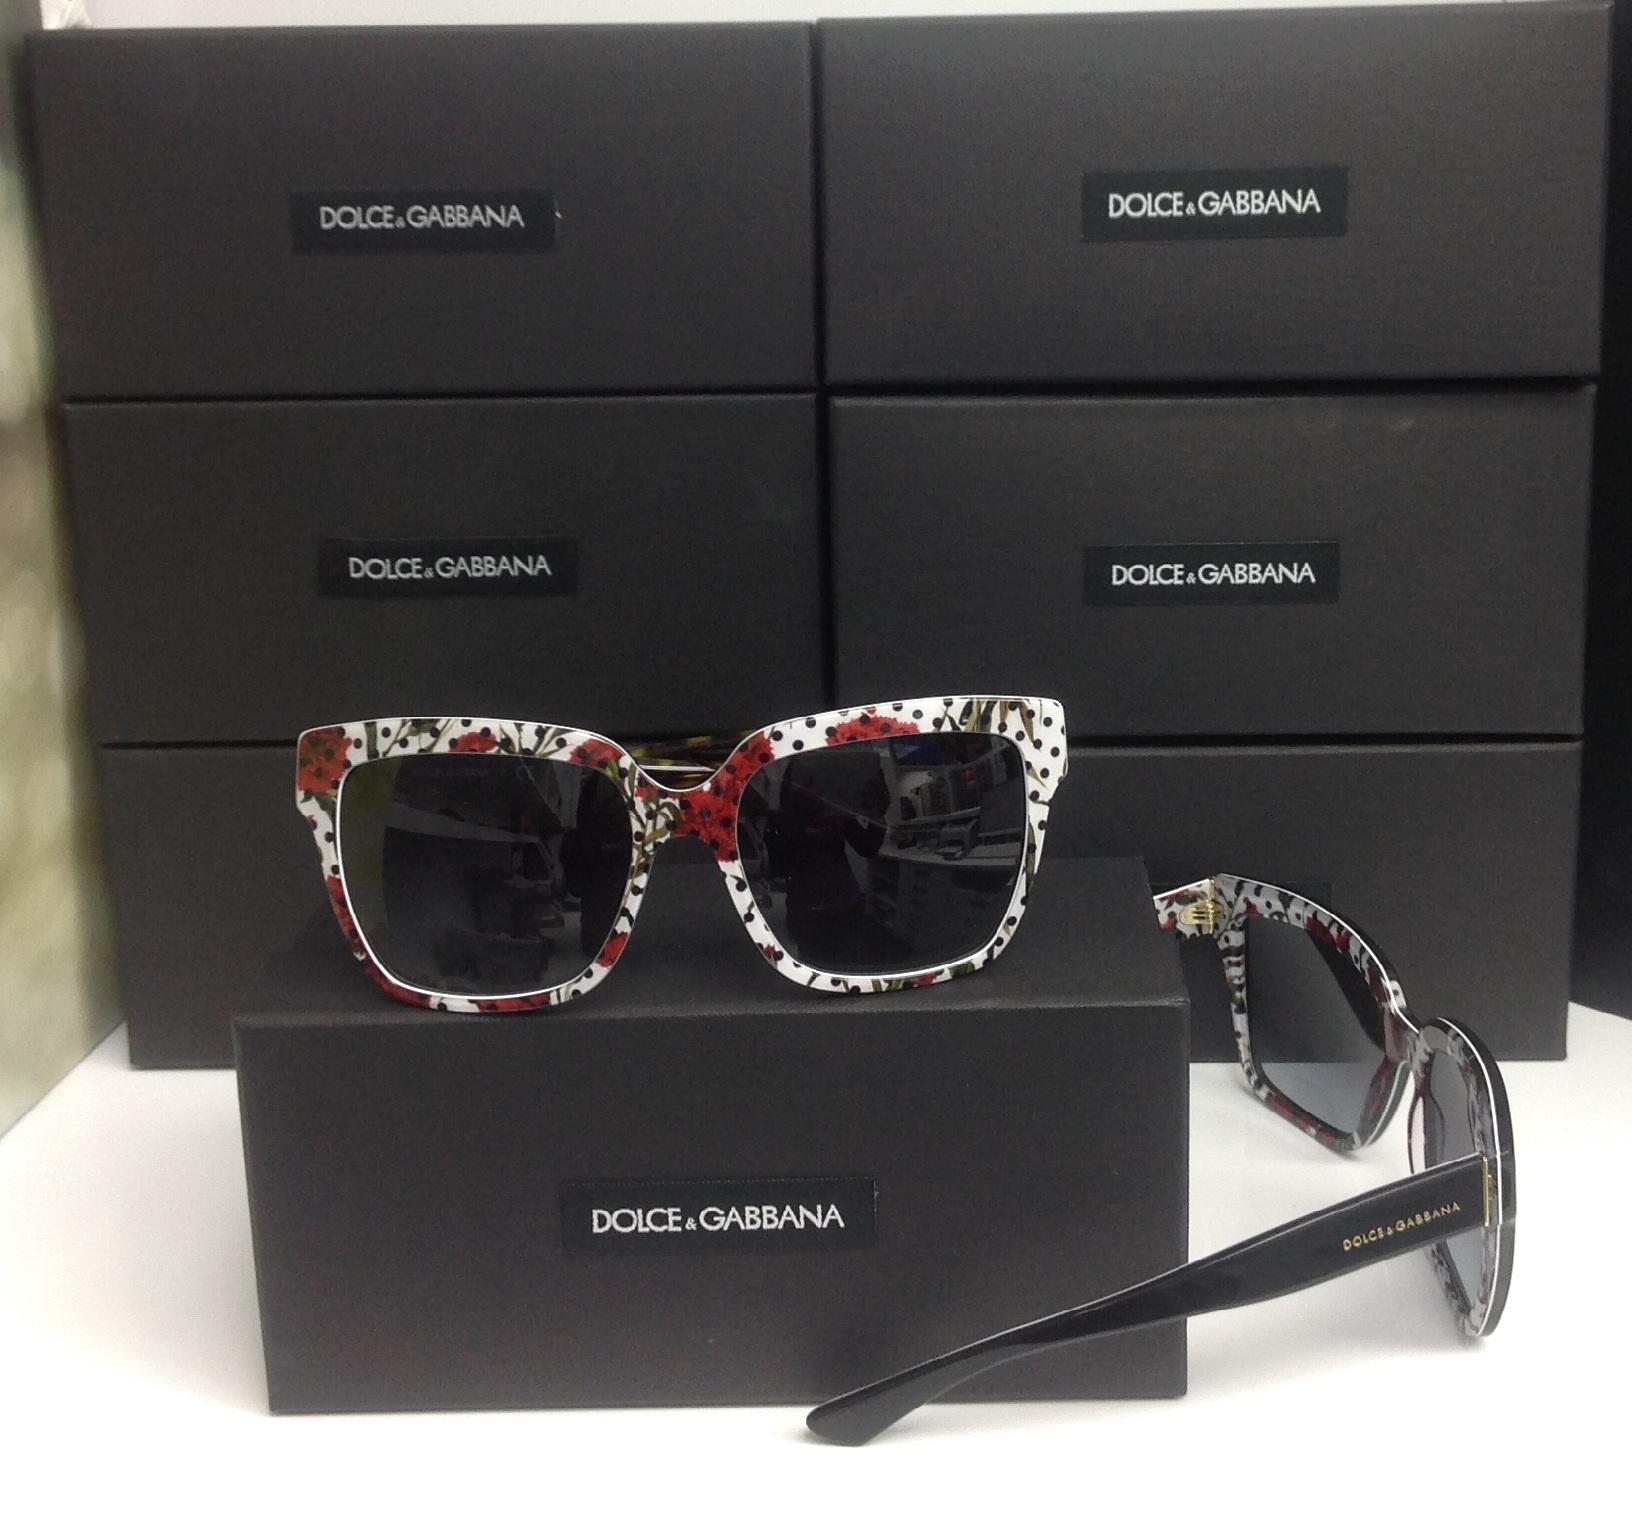 Romantične Dolce&Gabbana 4234 naočare